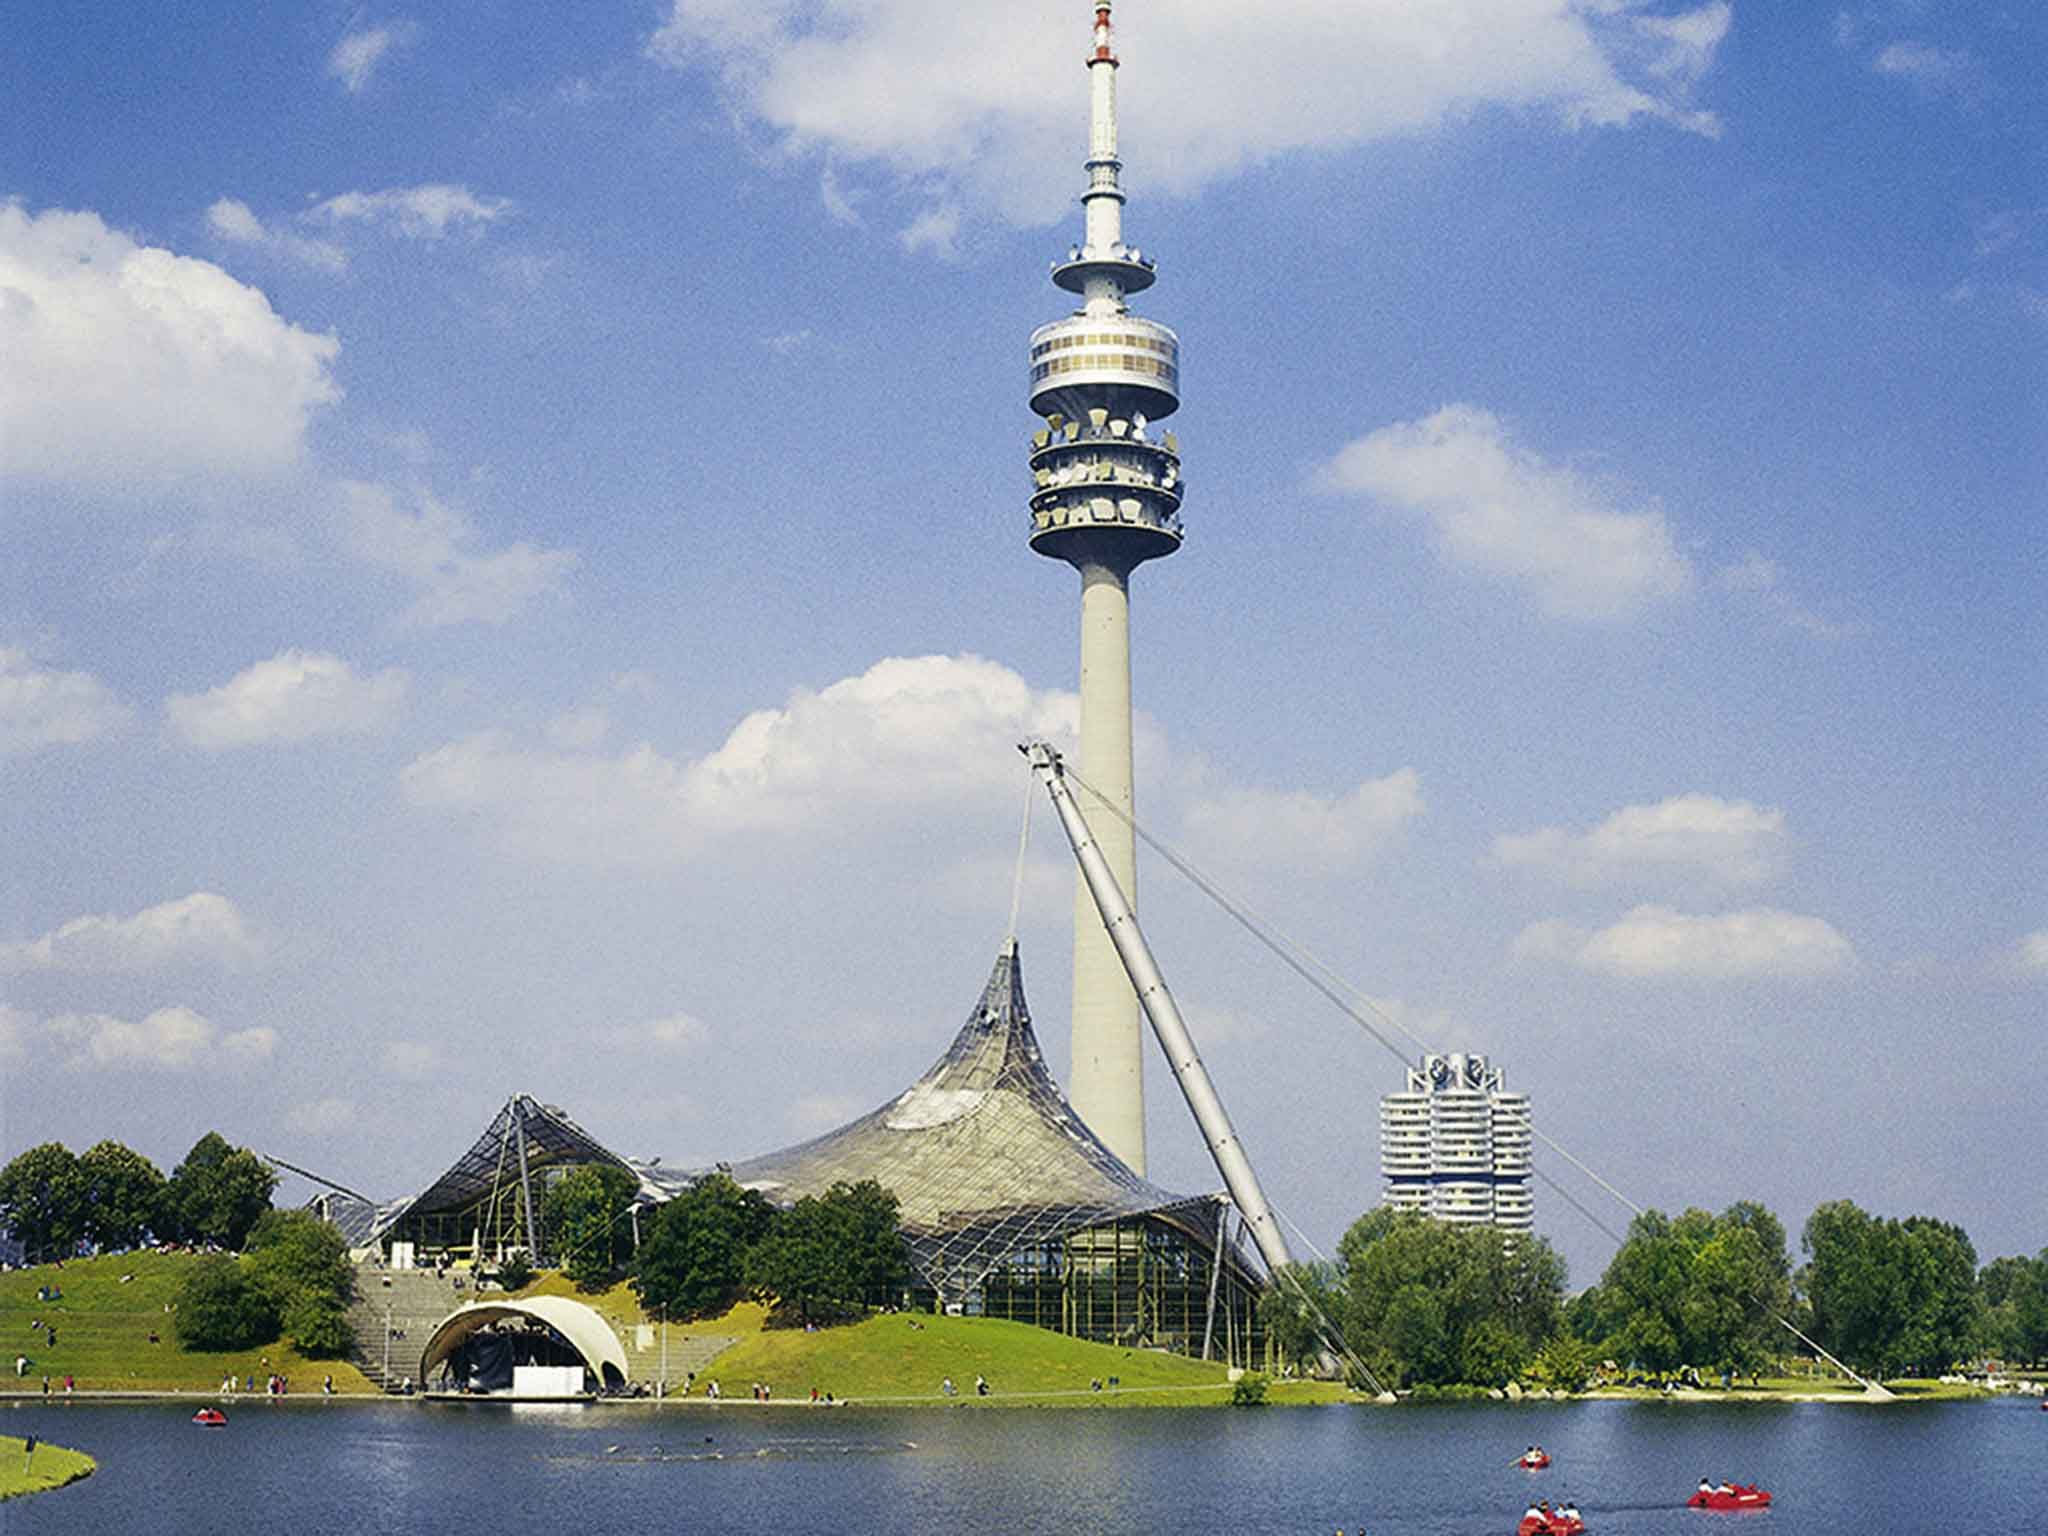 Hotel ibis Munich City Book your hotel in Munich now